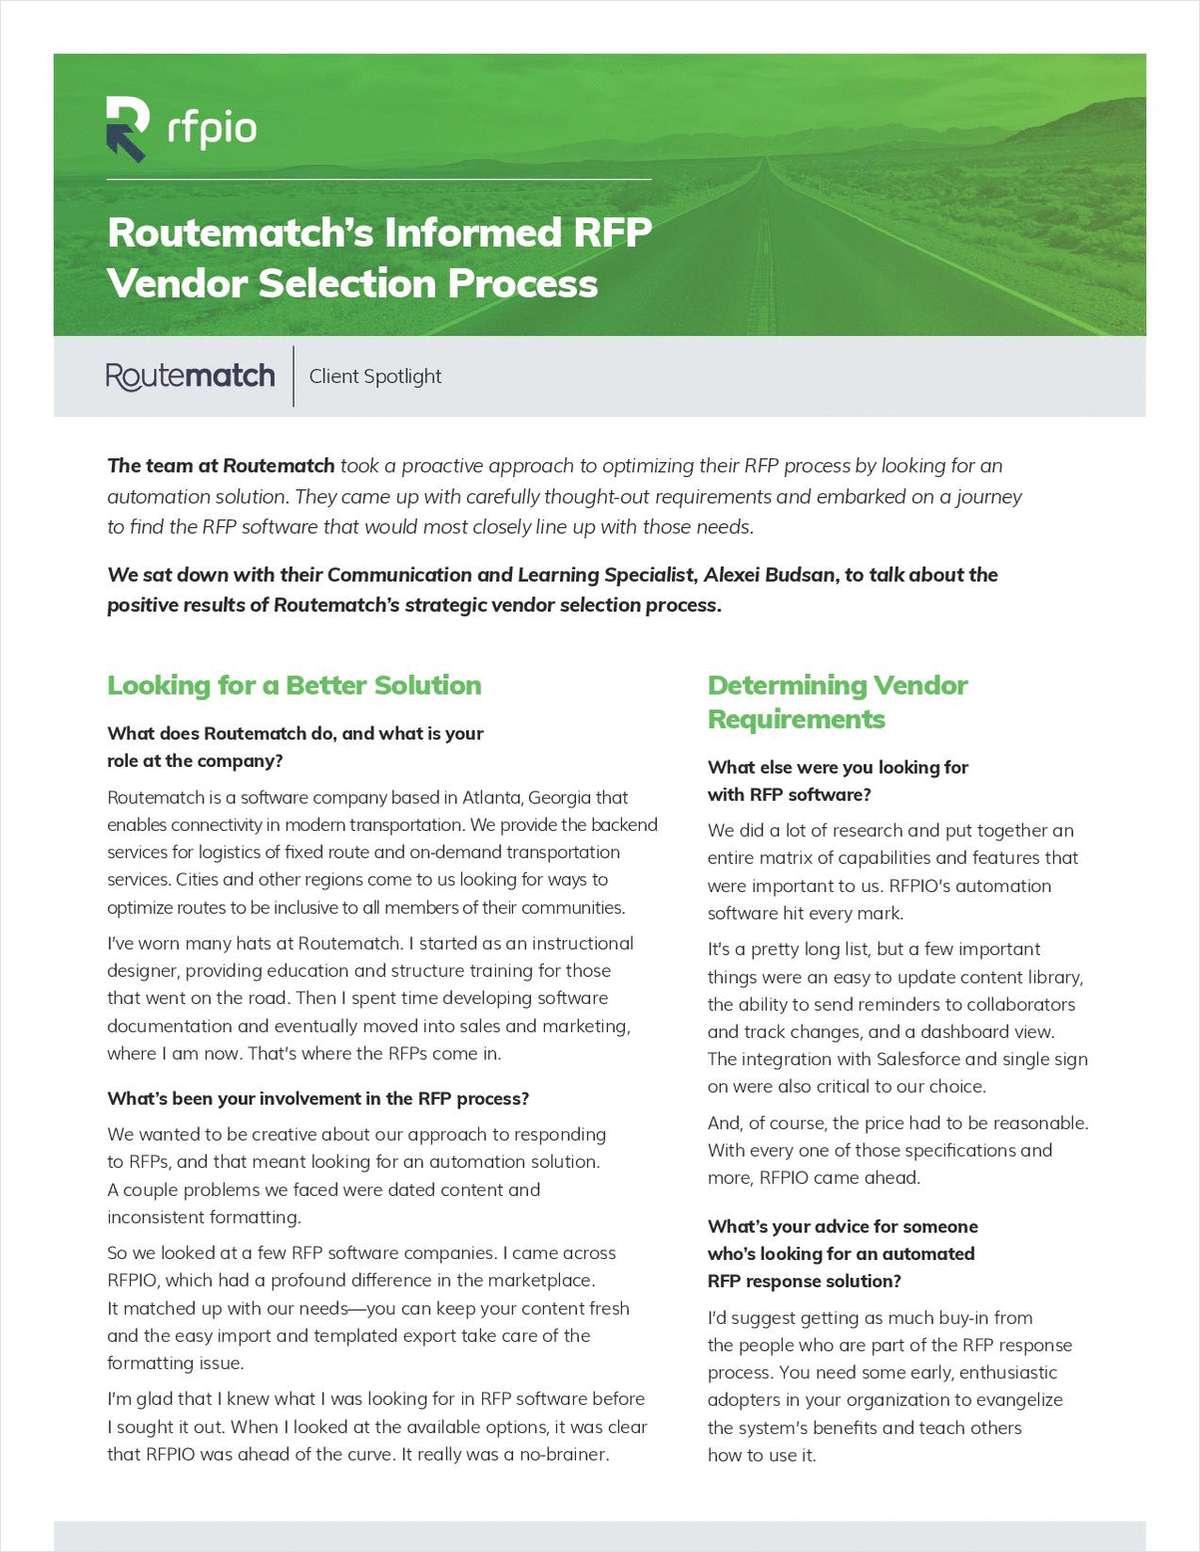 An Informed RFP Software Vendor Selection Process